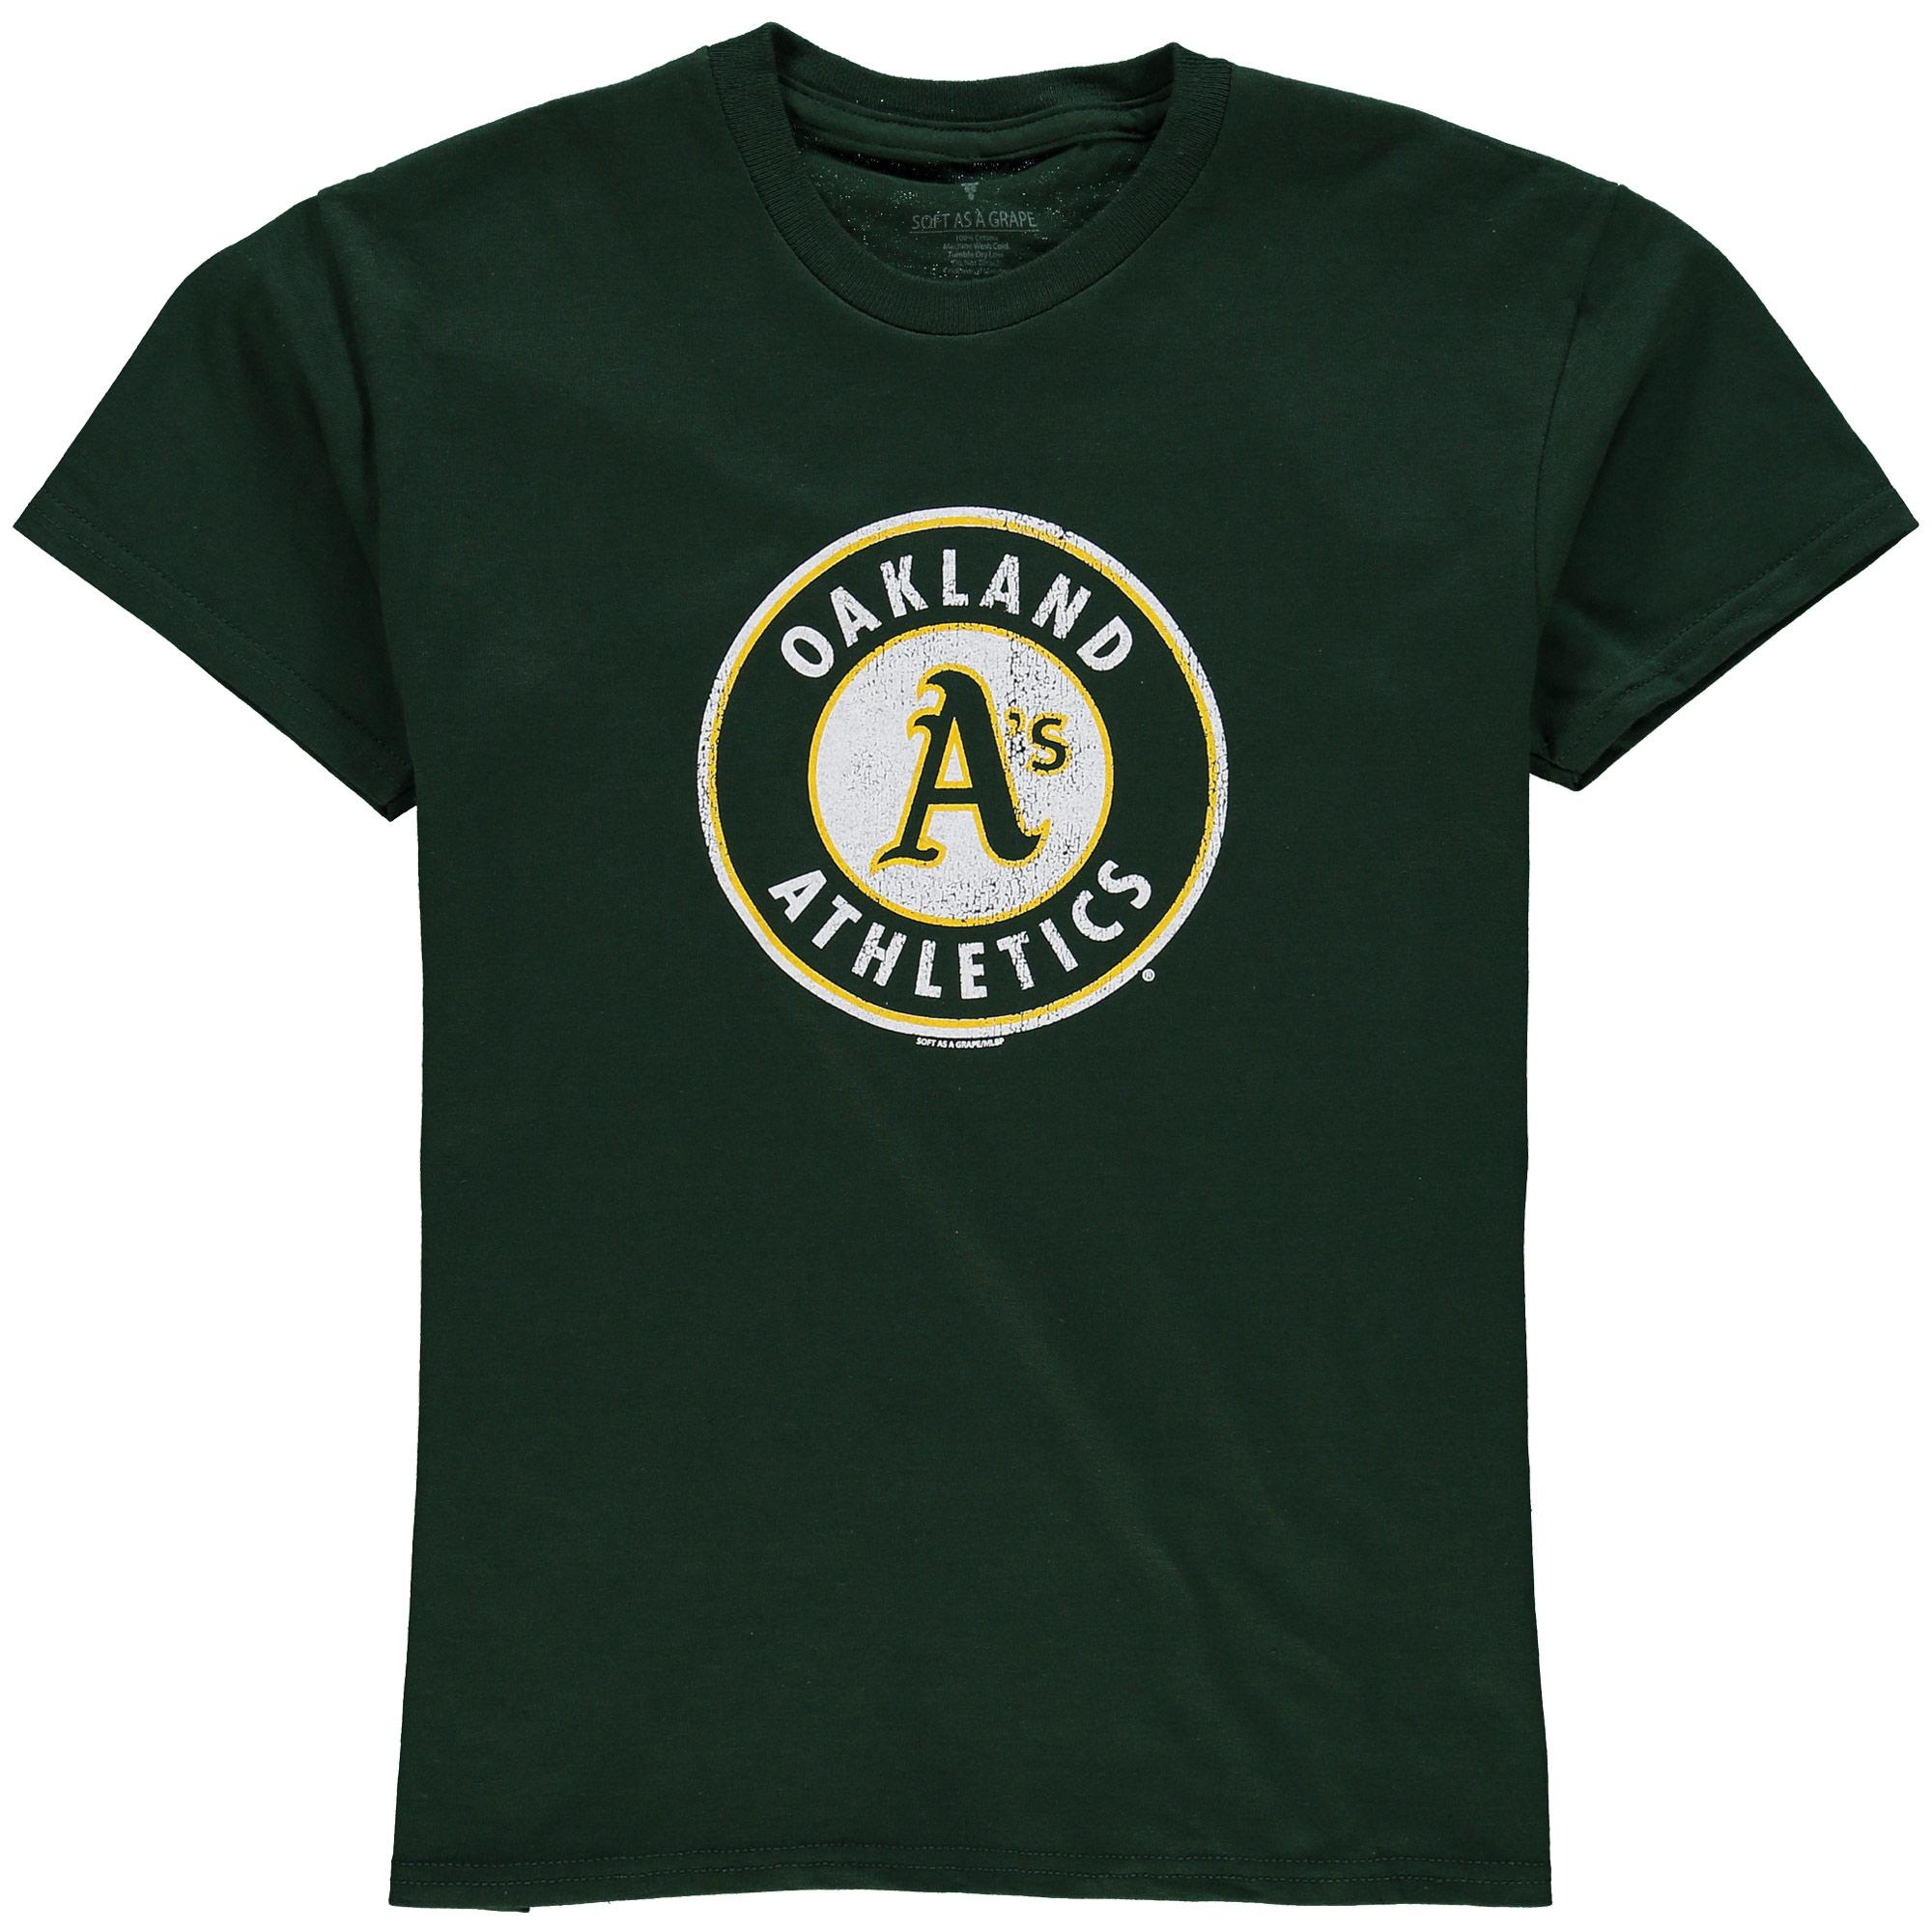 Oakland Athletics Youth Distressed Logo T-Shirt - Green